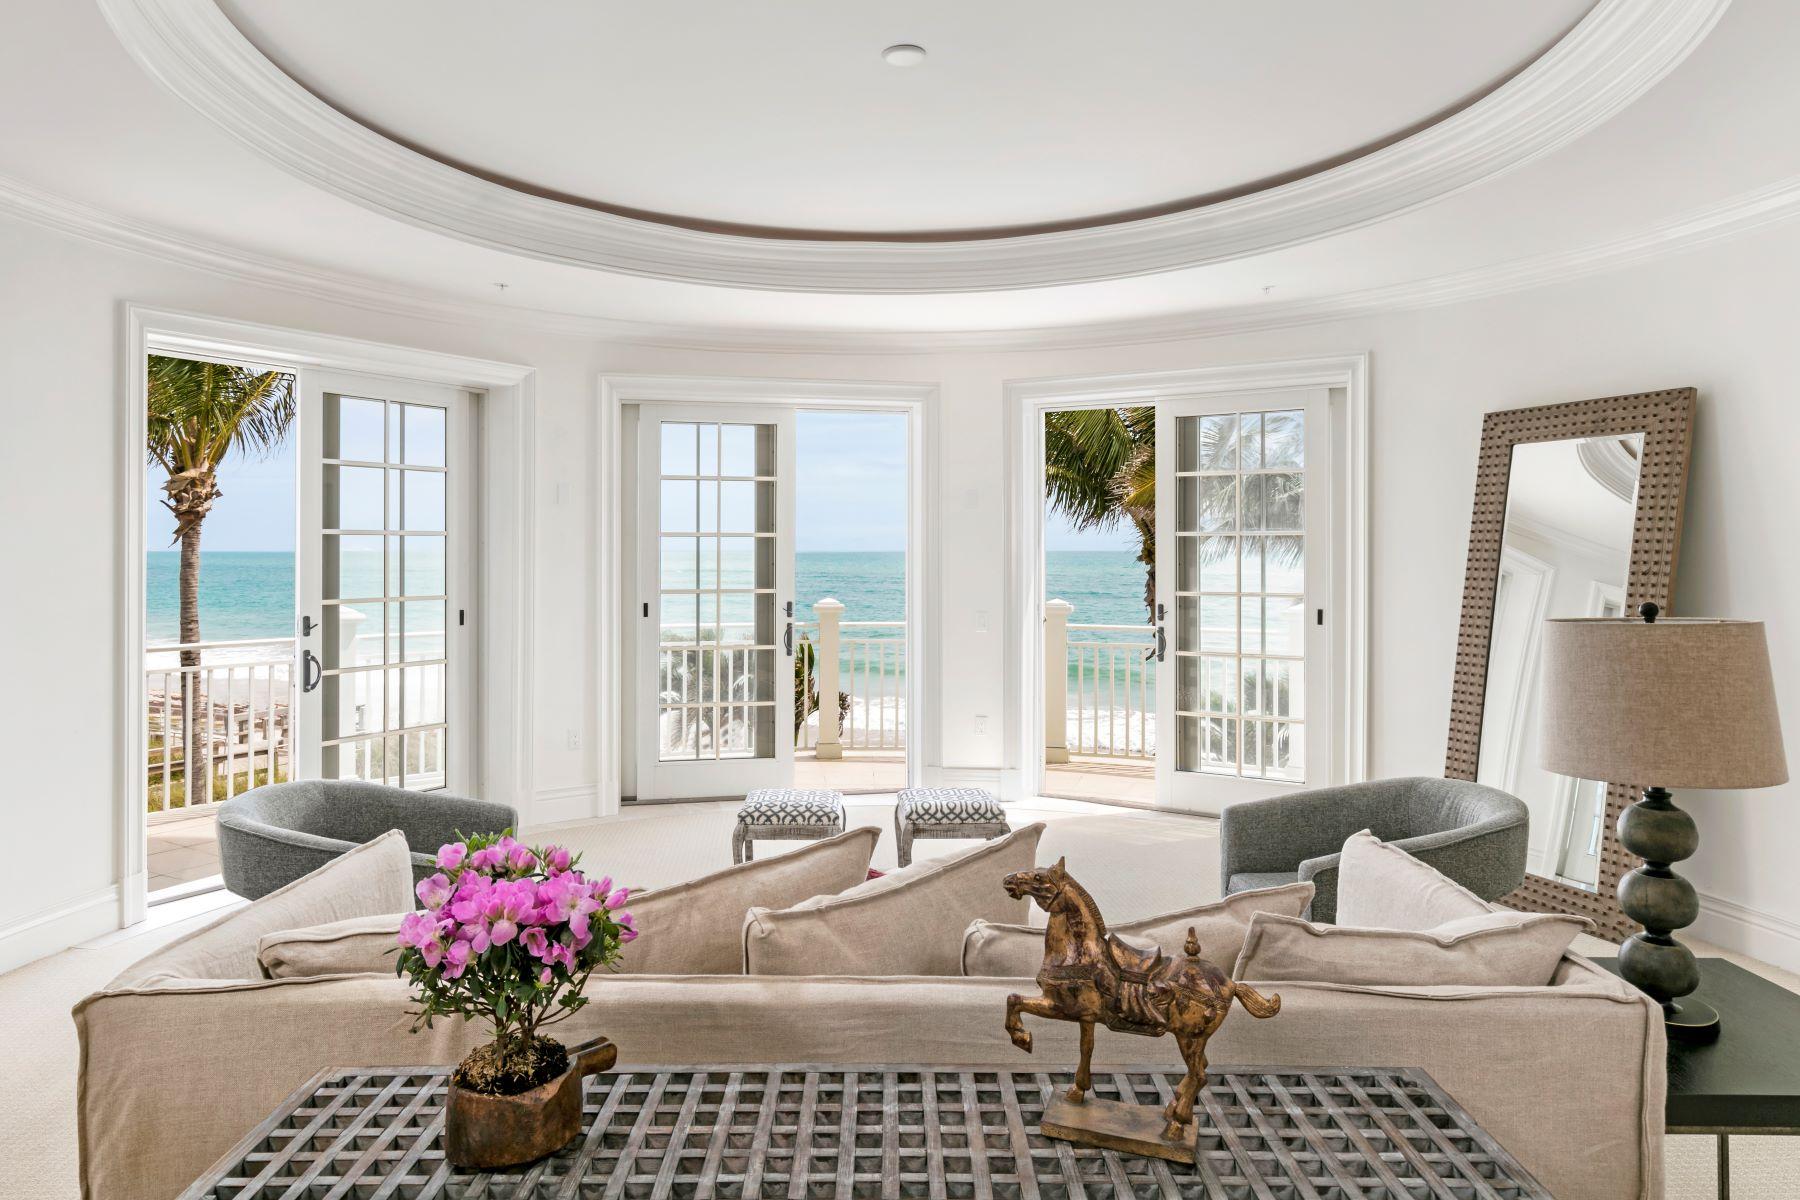 Property για την Πώληση στο 1010 Easter Lily Lane 204 Vero Beach, Φλοριντα 32963 Ηνωμένες Πολιτείες